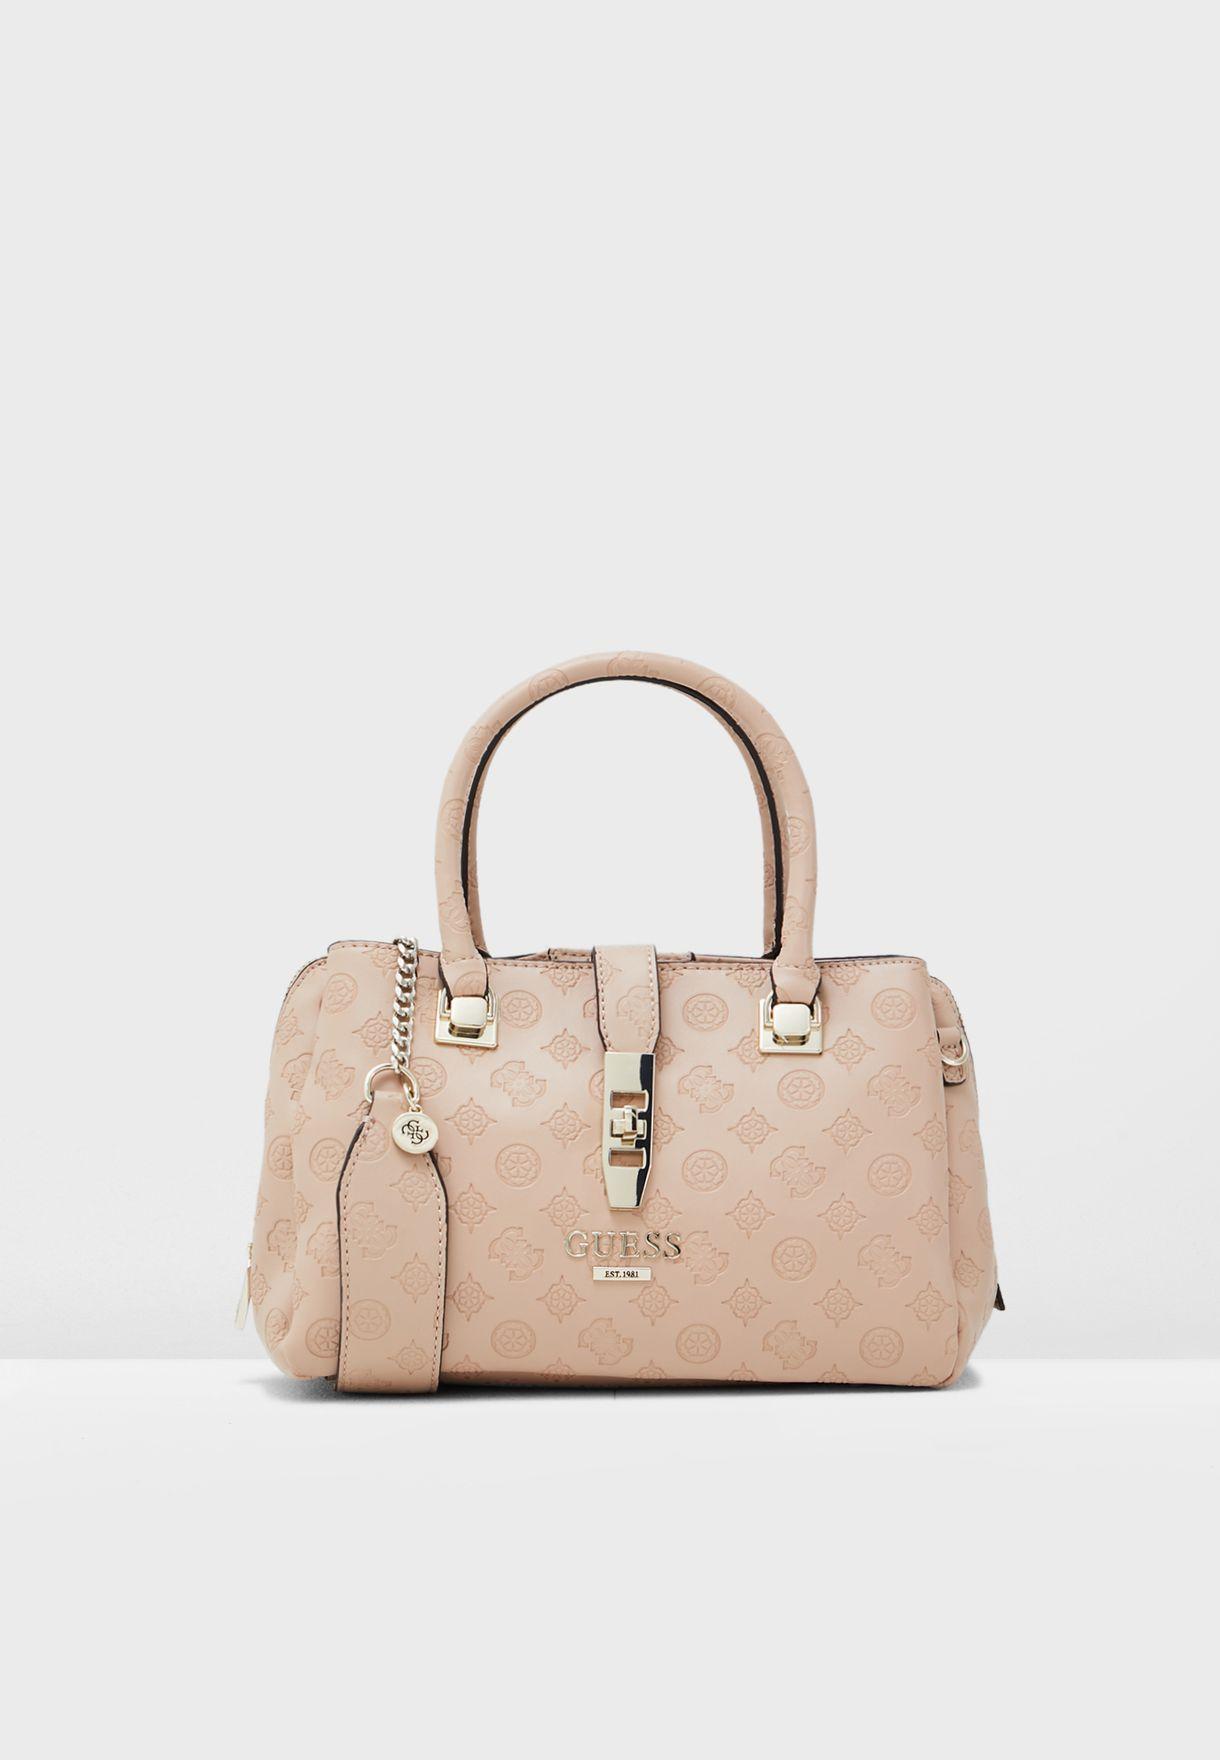 0e78463e8a Shop Guess pink Peony Classic Satchel SG739806 for Women in Saudi ...